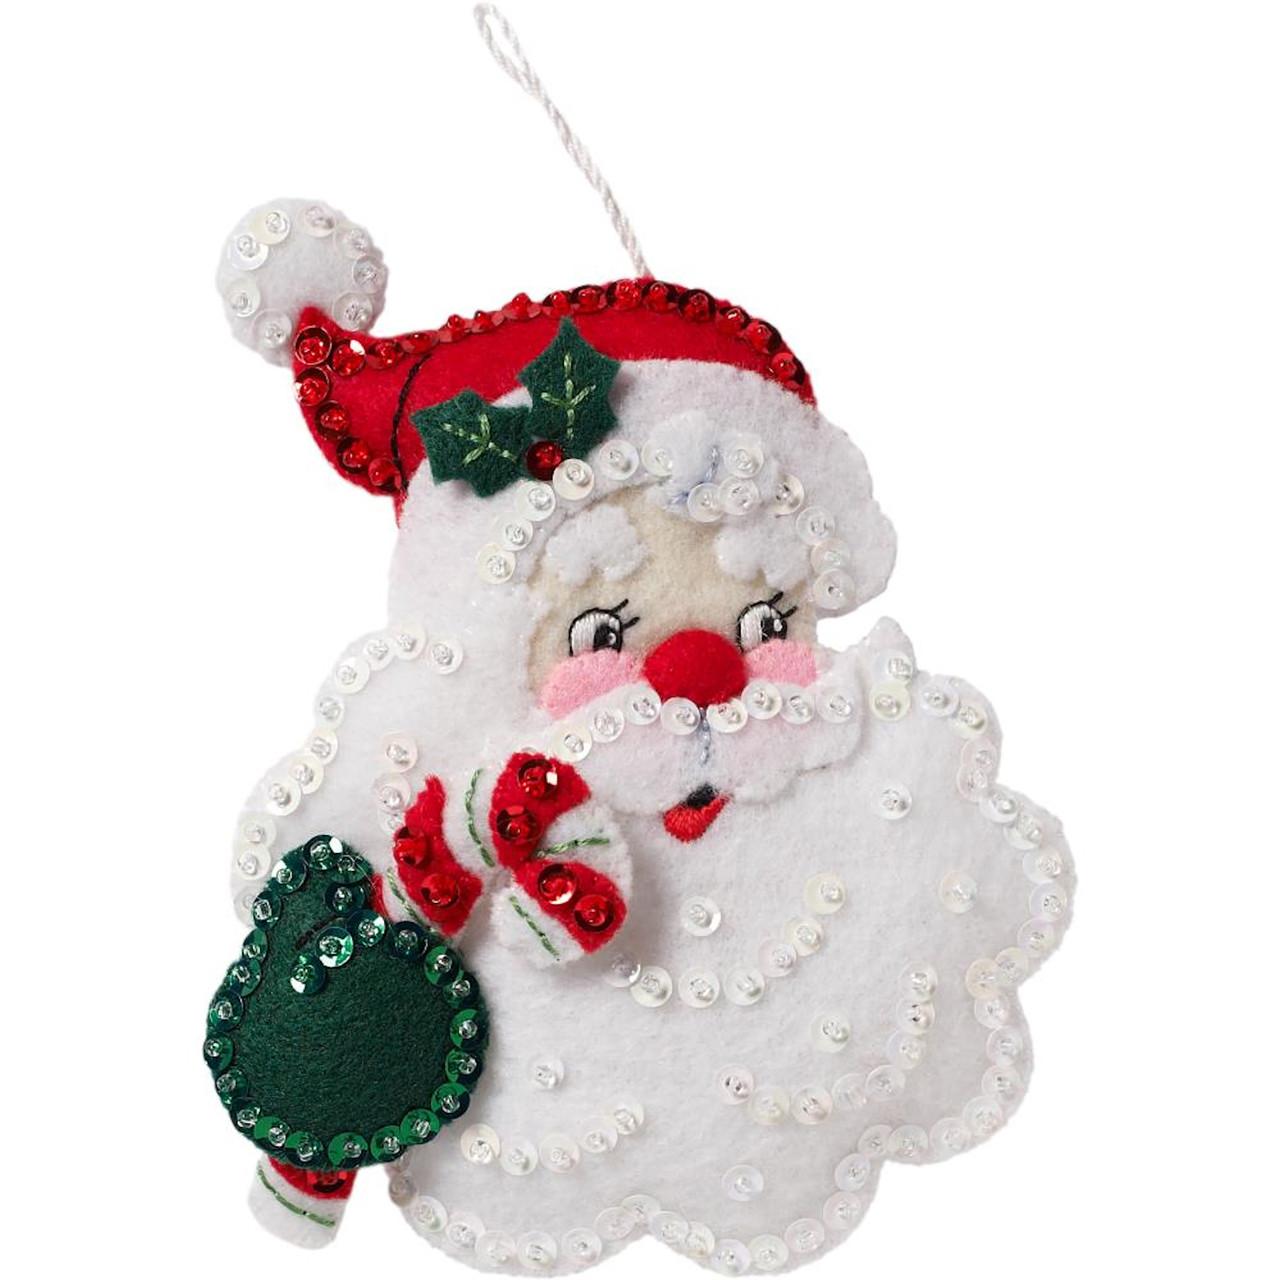 Bonus Ornament (included)